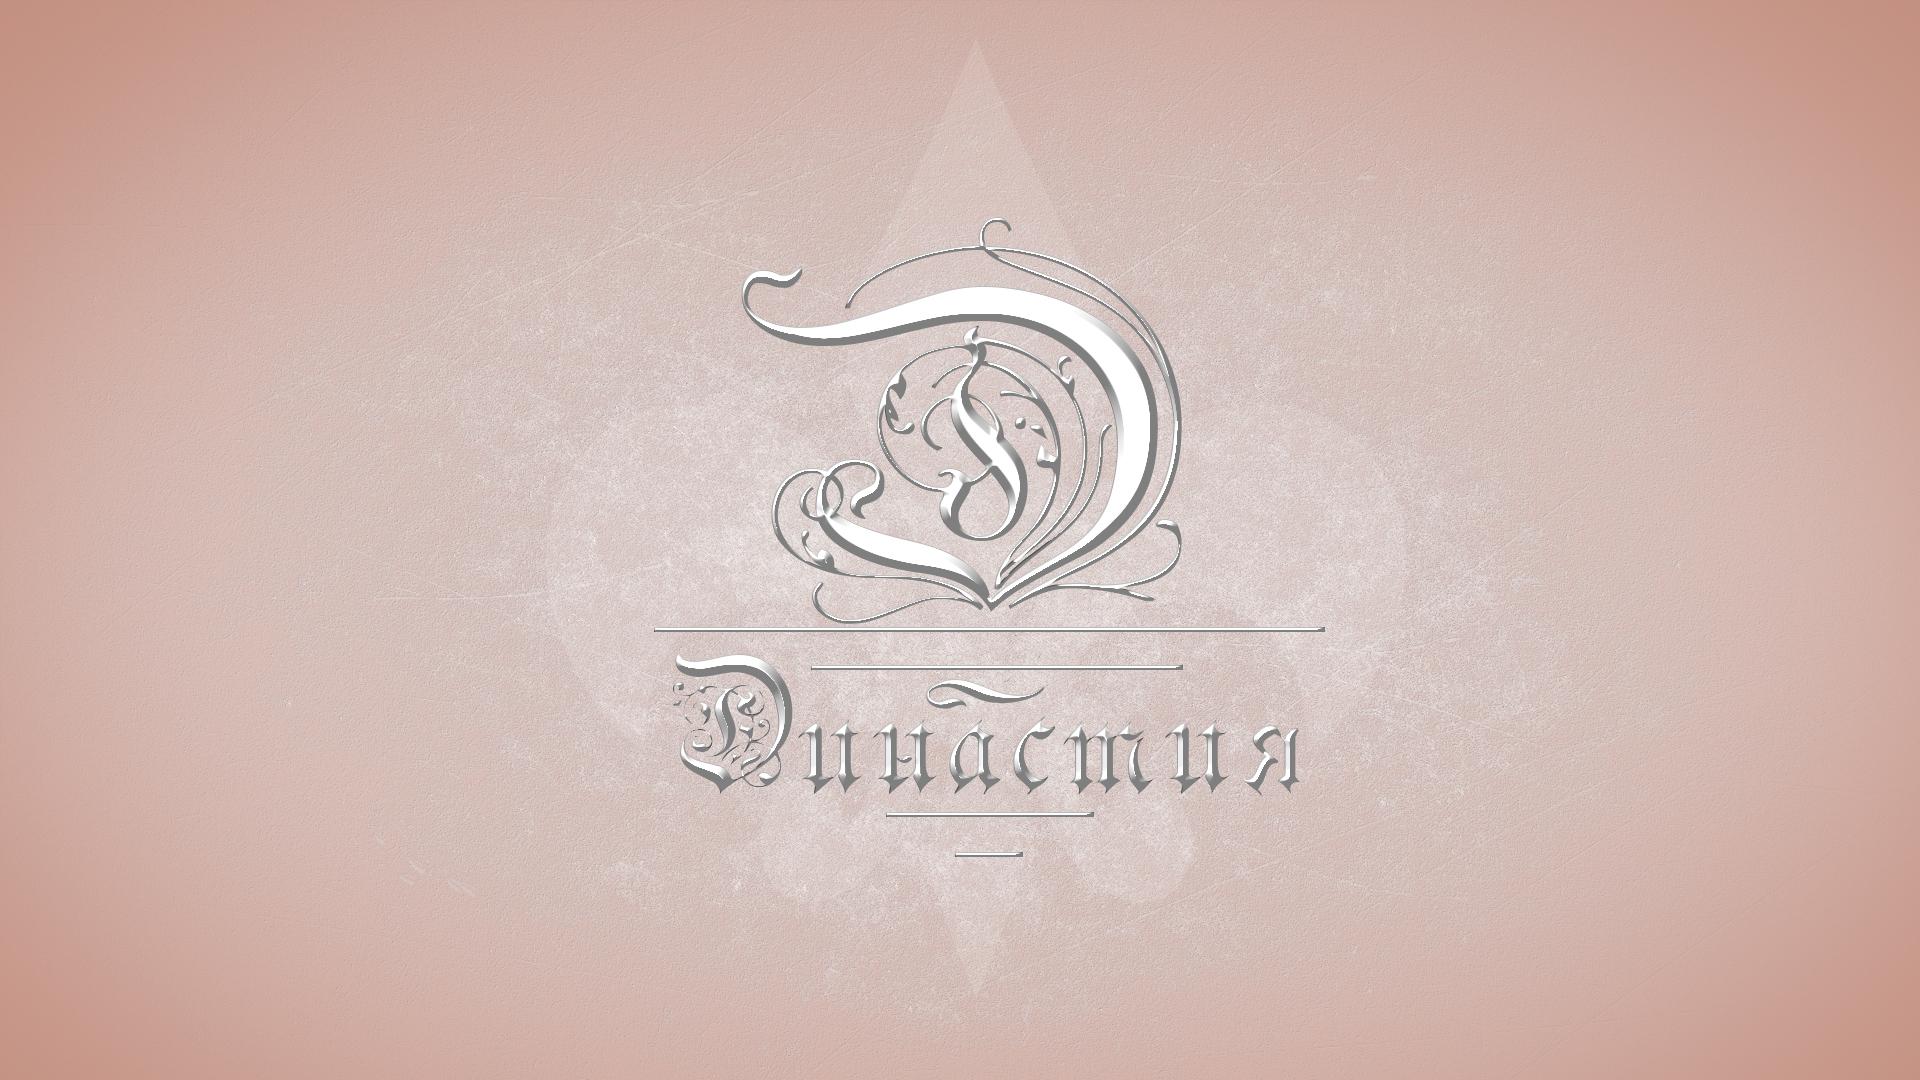 Разработать логотип для нового бренда фото f_03759e26eeeea8f7.jpg